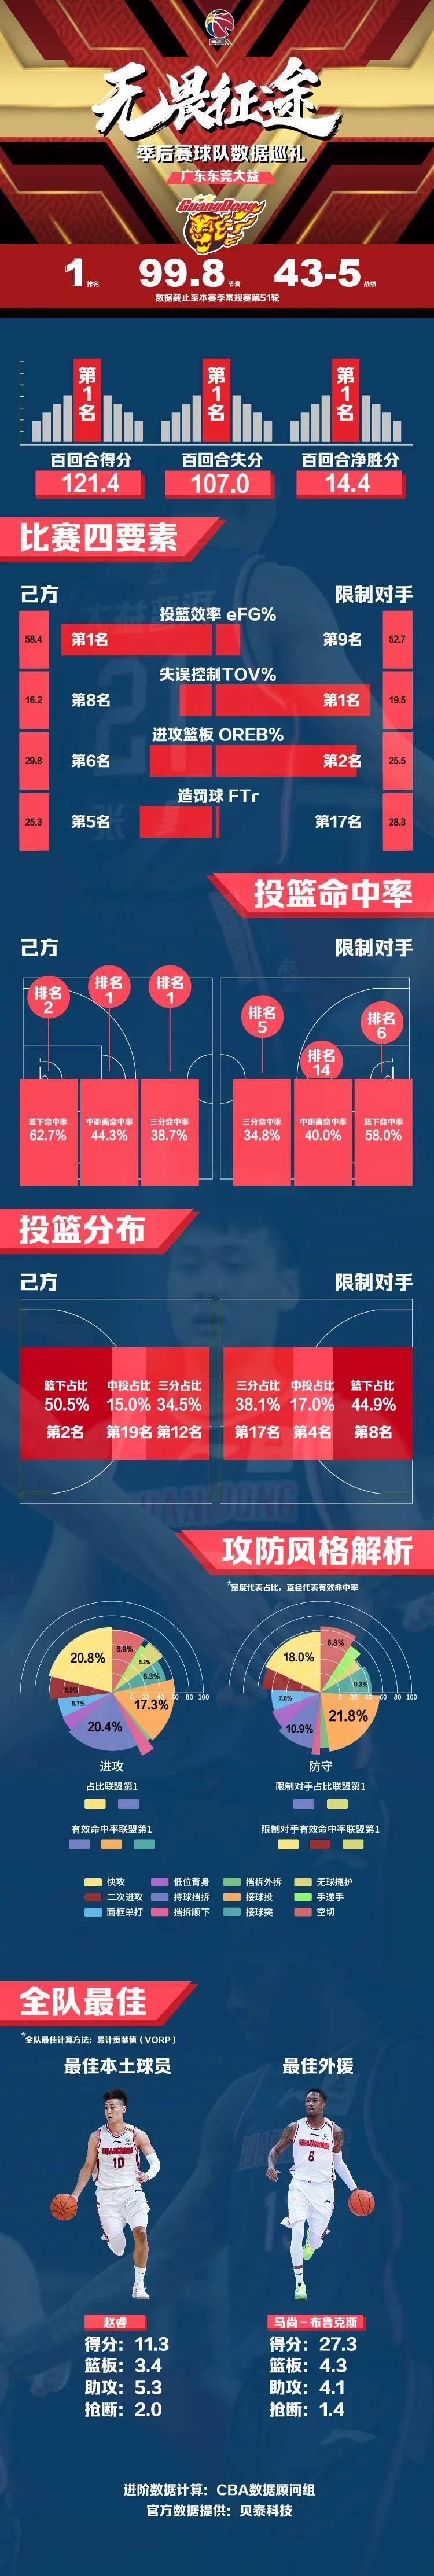 CBA季后赛四强球队数据巡礼:广东无愧联盟第一